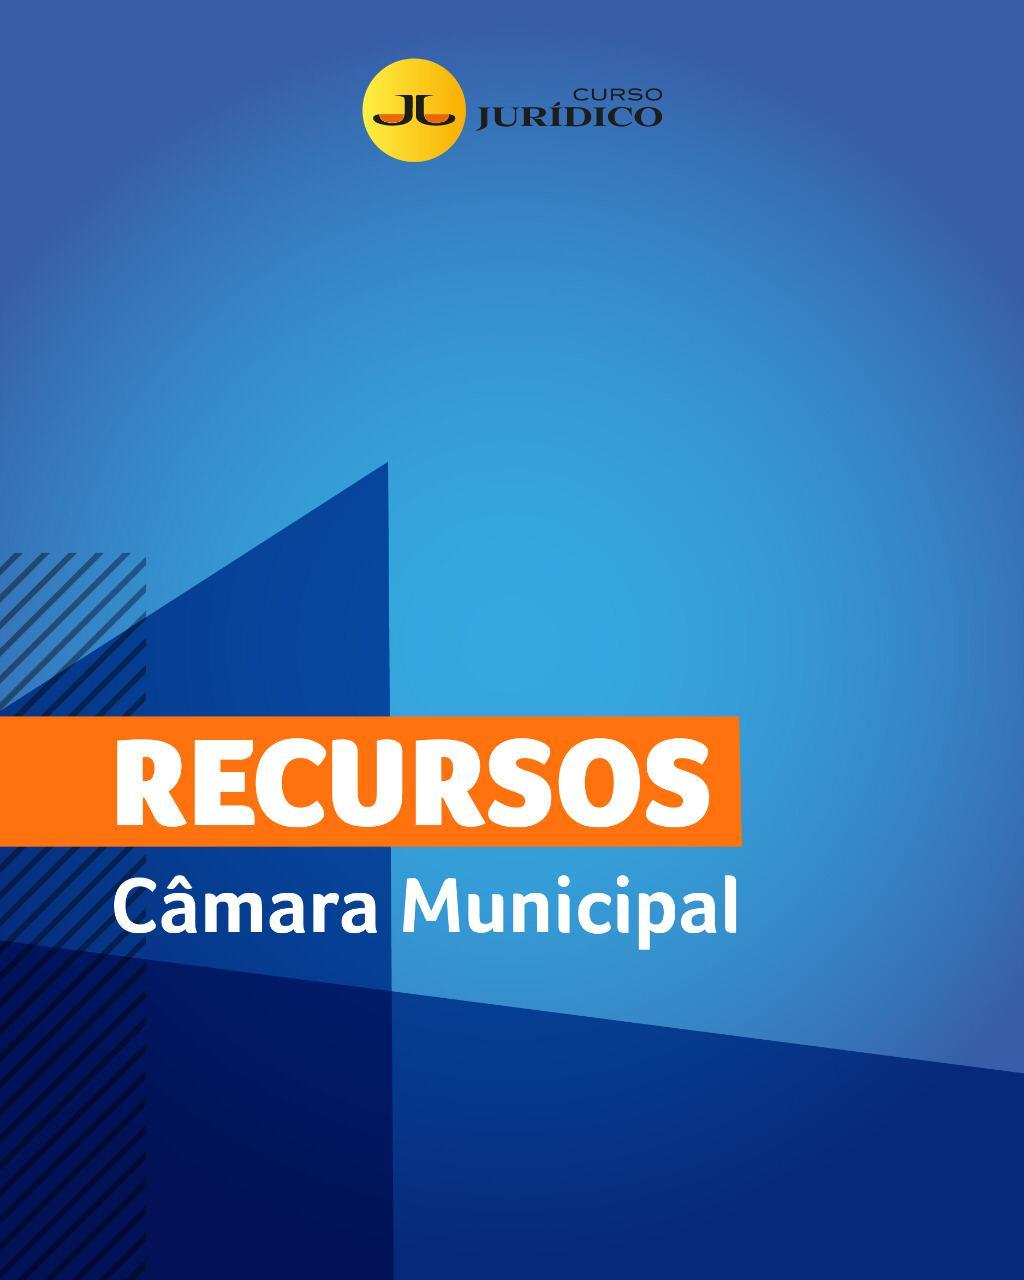 Recursos: ANALISTA - CÂMARA MUNICIPAL DE CURITIBA